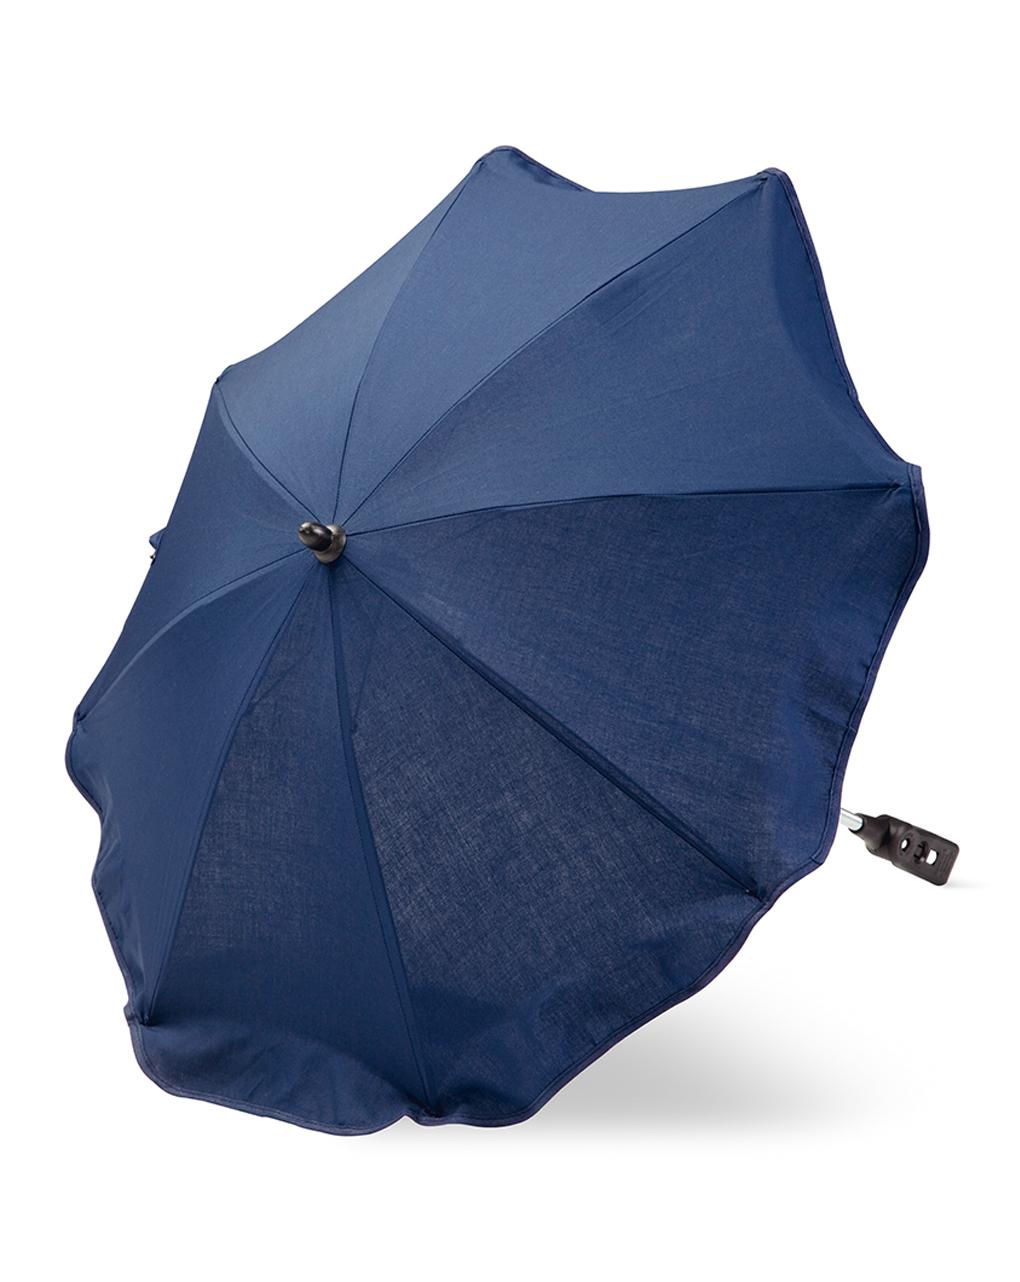 Giordani Ομπρέλα Καροτσιού-Μπλε